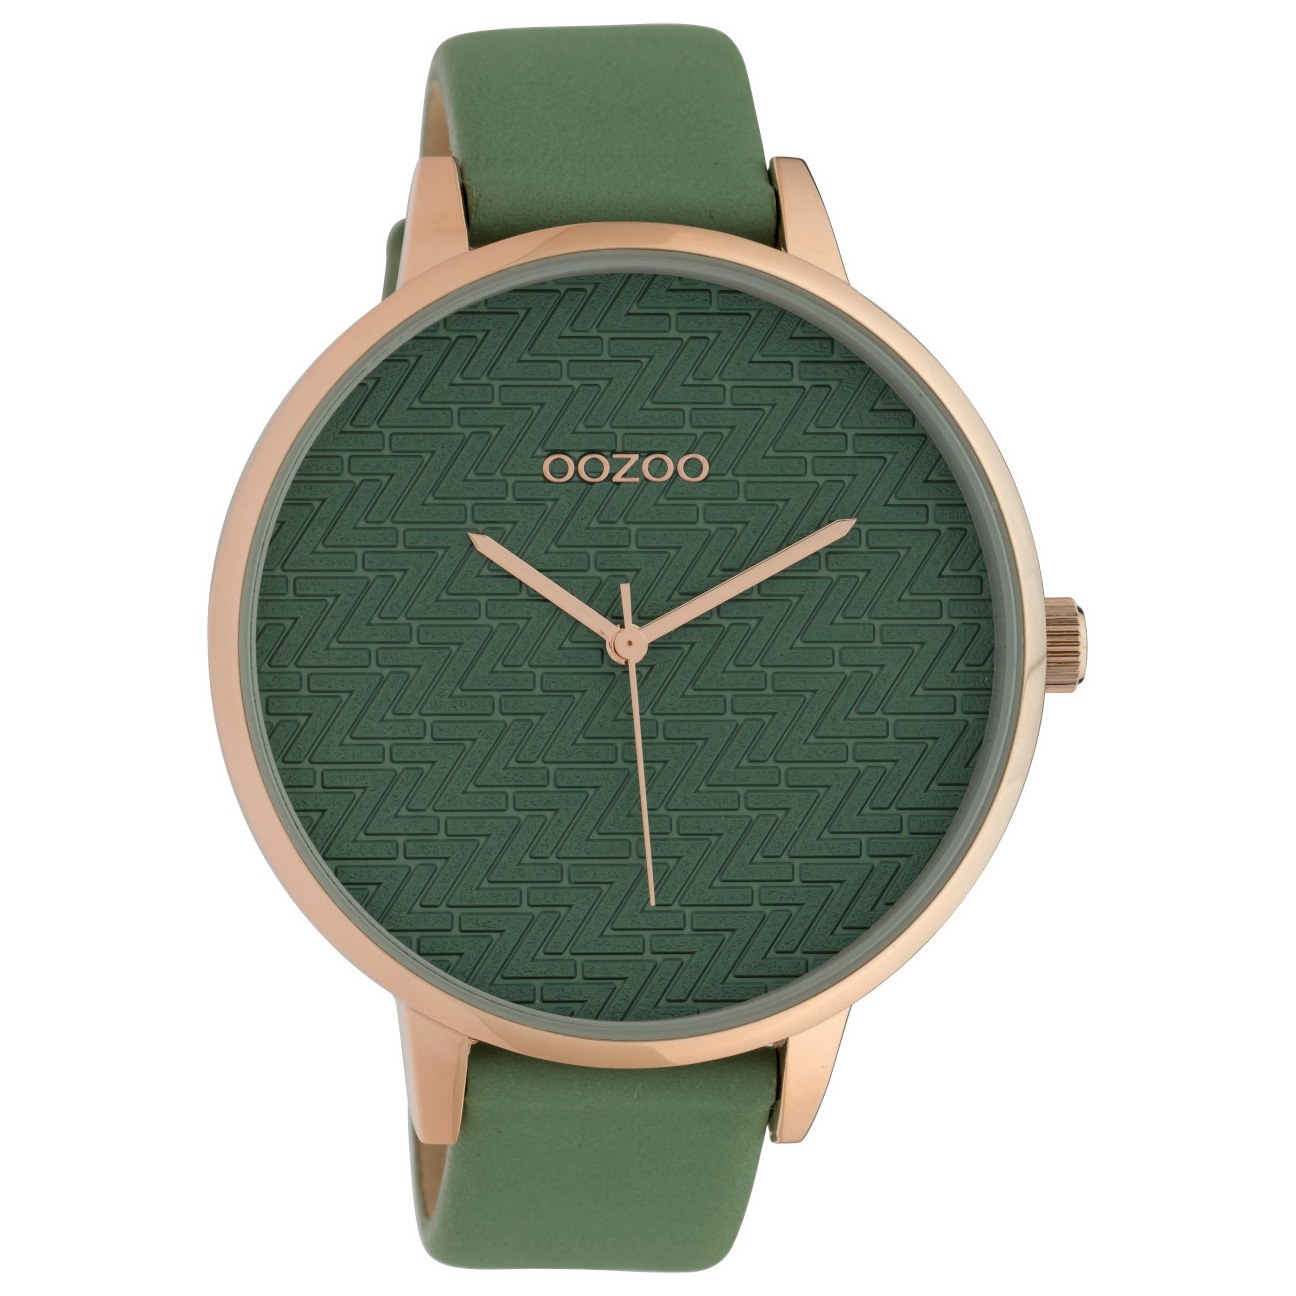 OOZOO C10407 Horloge Timepiece Collection Lilypad 48 mm